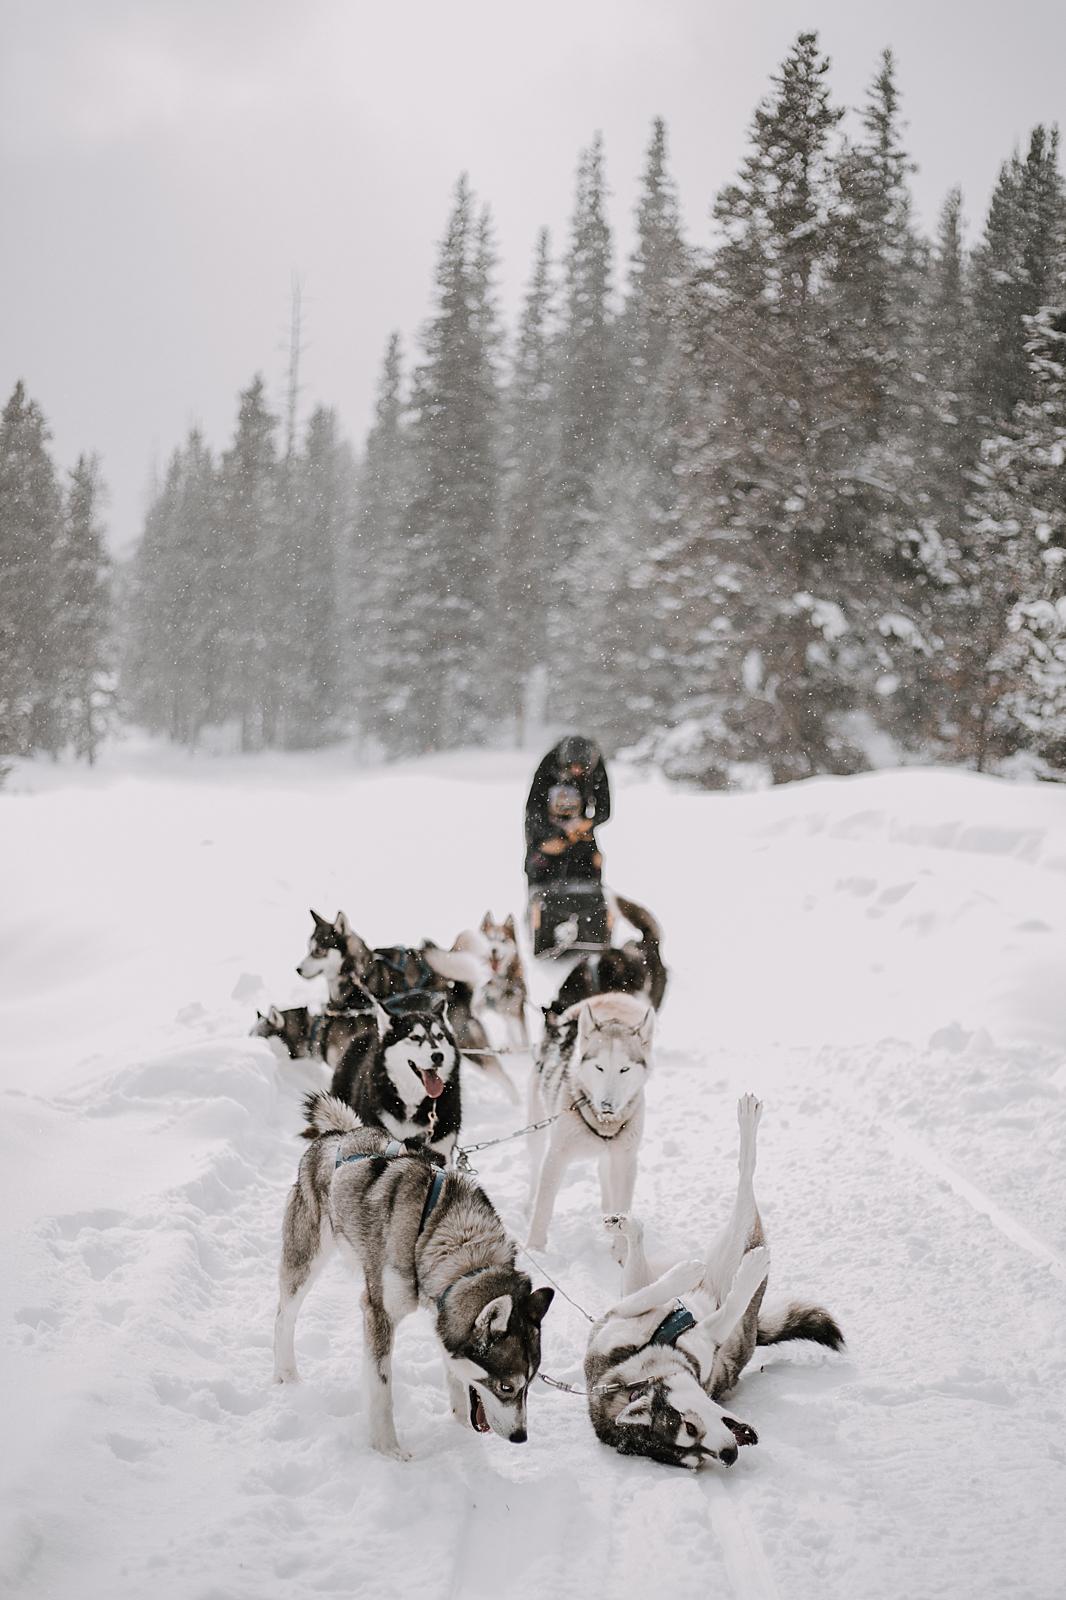 husky rolling in the snow, sled dog, dogsledding, winter, winter elopement, winter wedding, breckenridge colorado photographer, colorado dog sledding, dogsledding elopement, snowmobiling elopement